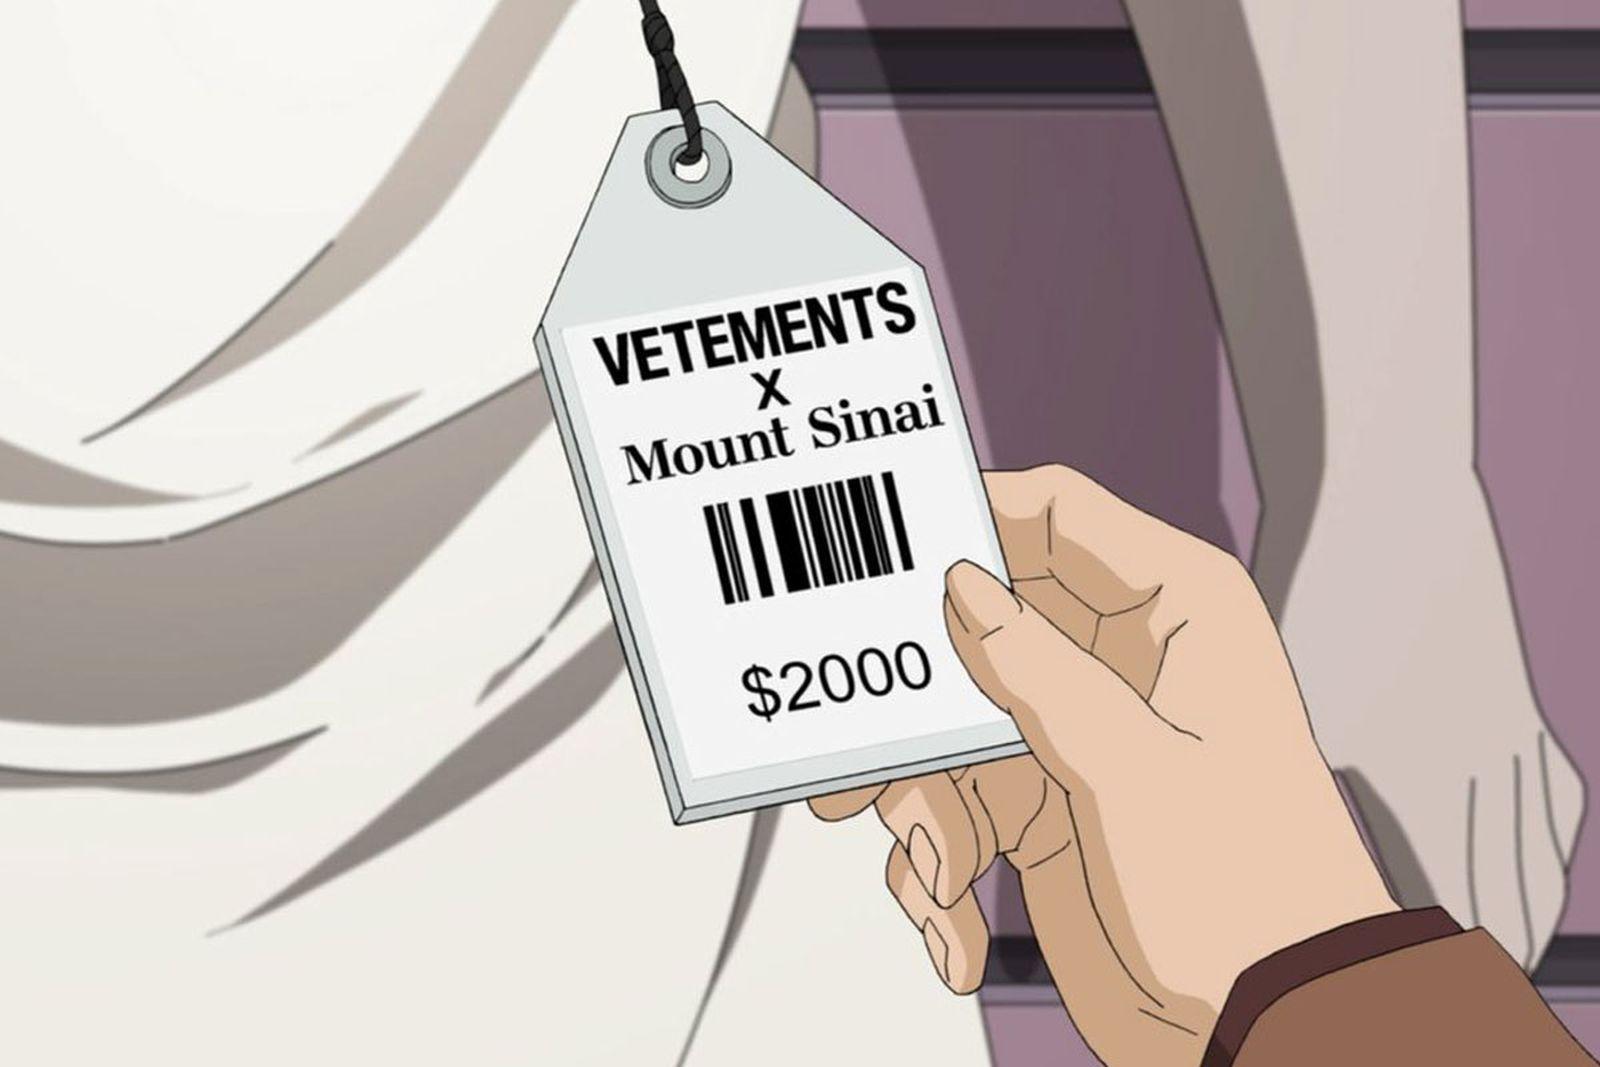 neo yokio pink christmas fashion references vetements anime jaden smith netflix